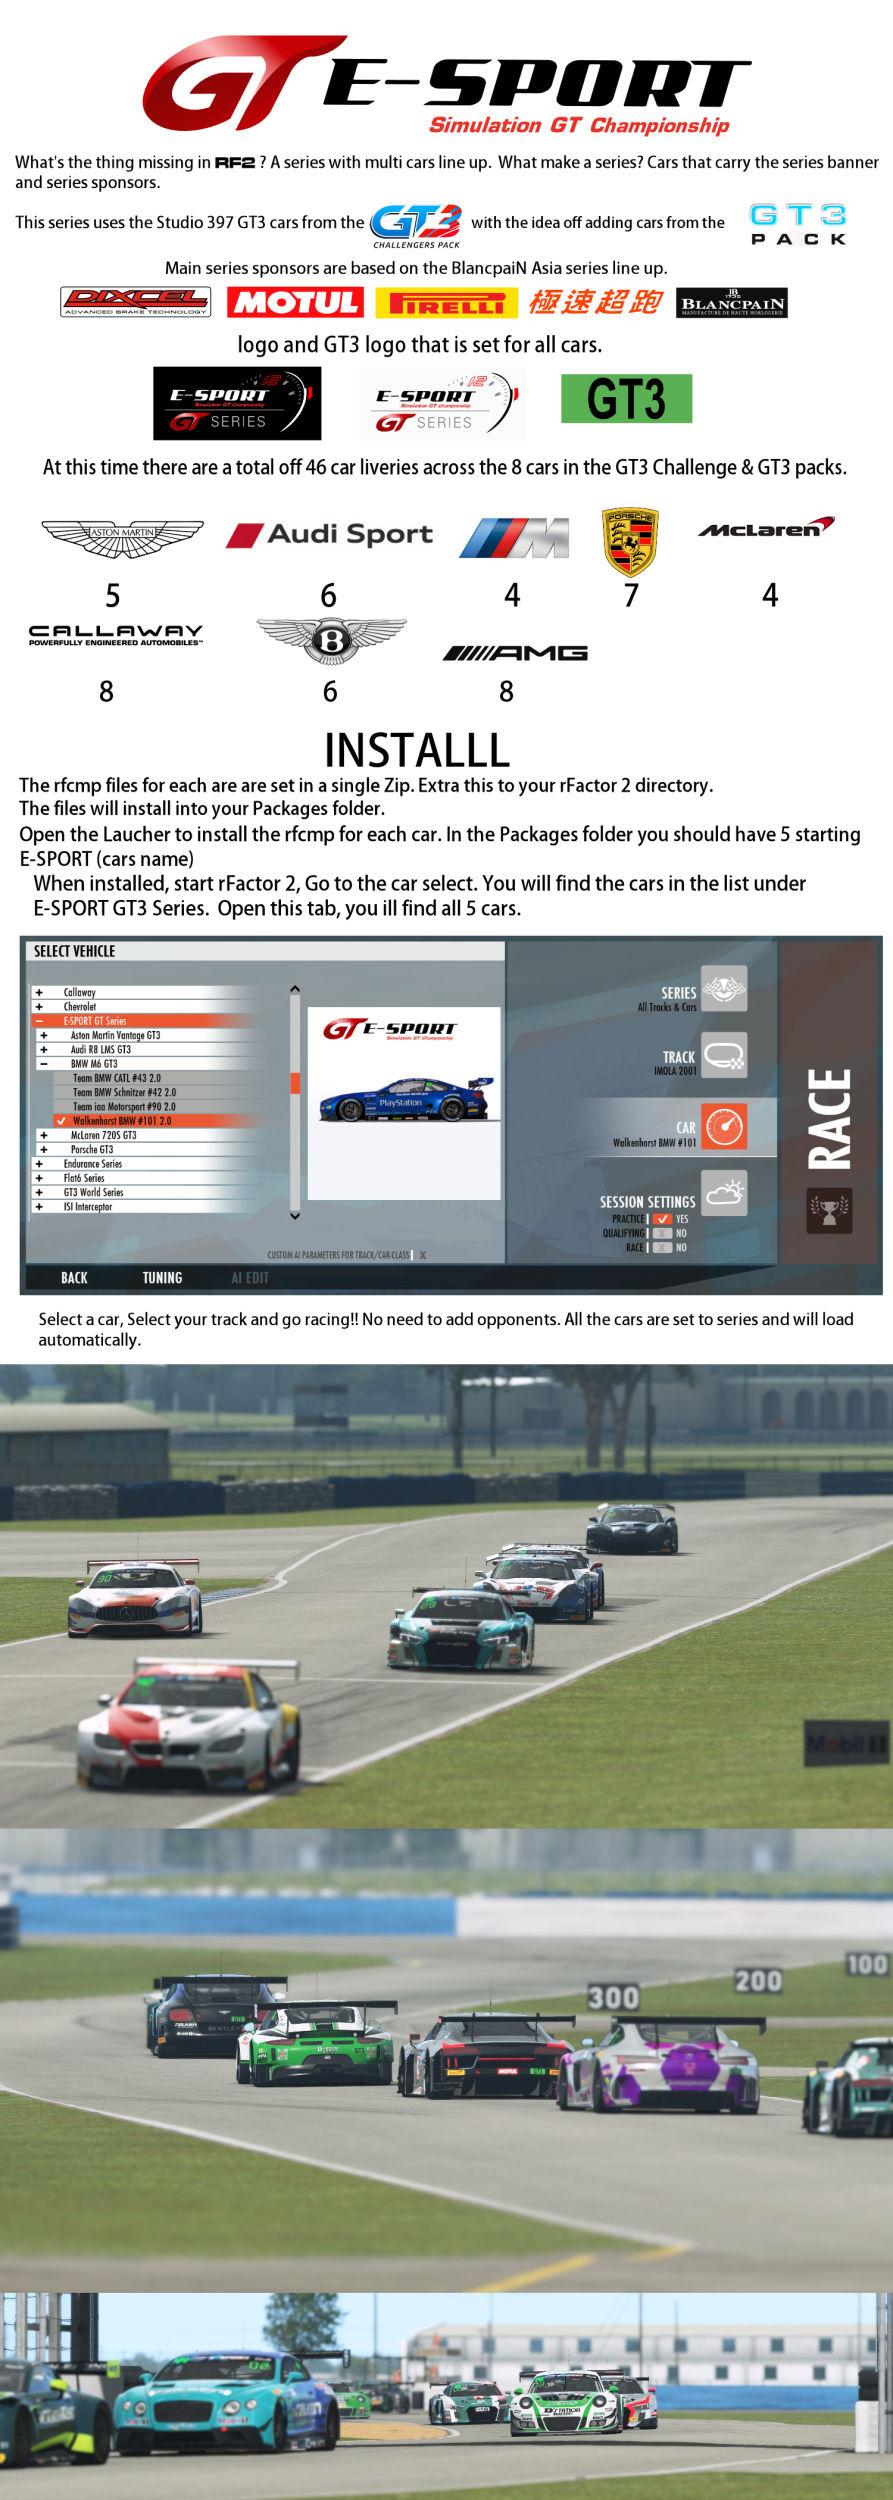 E-Sport_Info.jpg